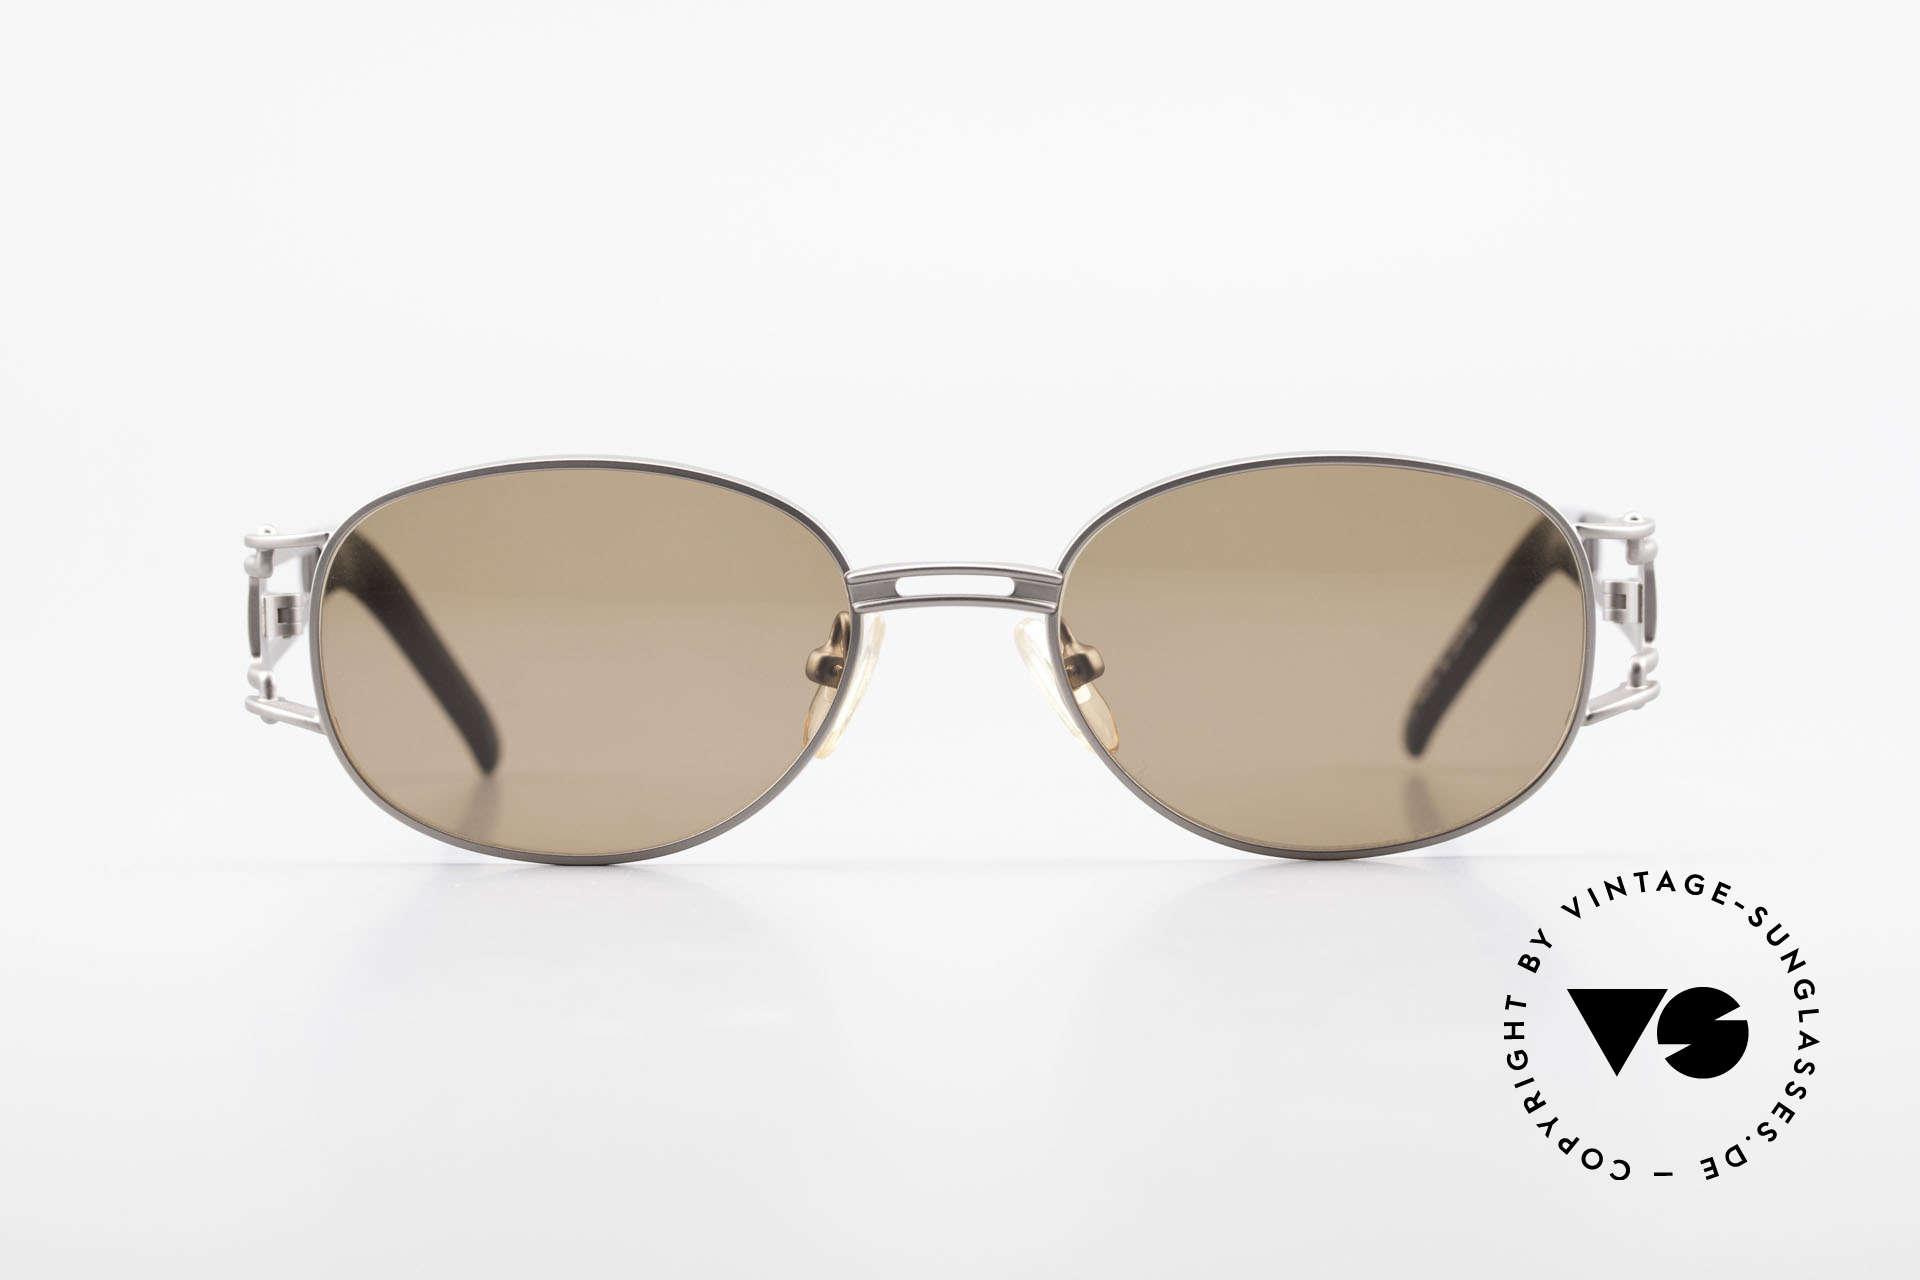 Yohji Yamamoto 52-6106 Designer Shades Vintage Oval, extraordinary but subtle design elements; AVANT-GARDE, Made for Men and Women